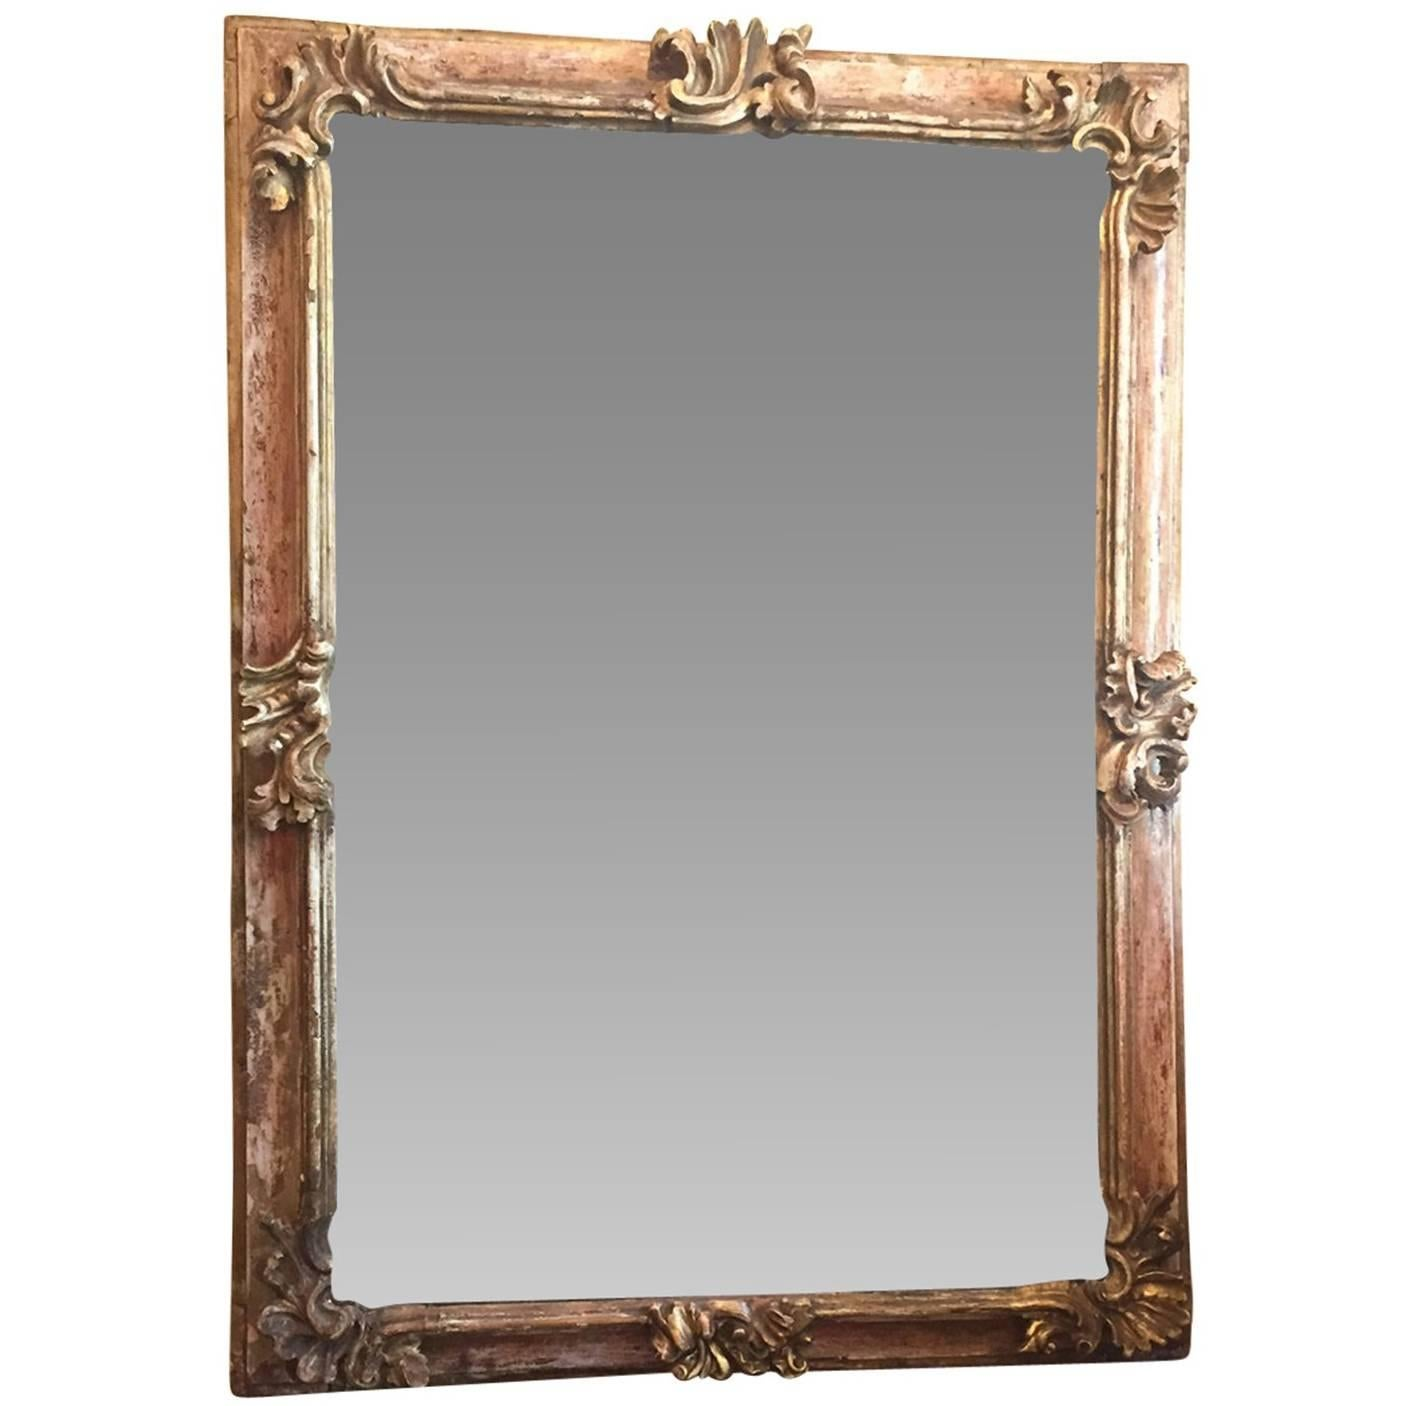 19th Century Early Italian Baroque Framed Mirror